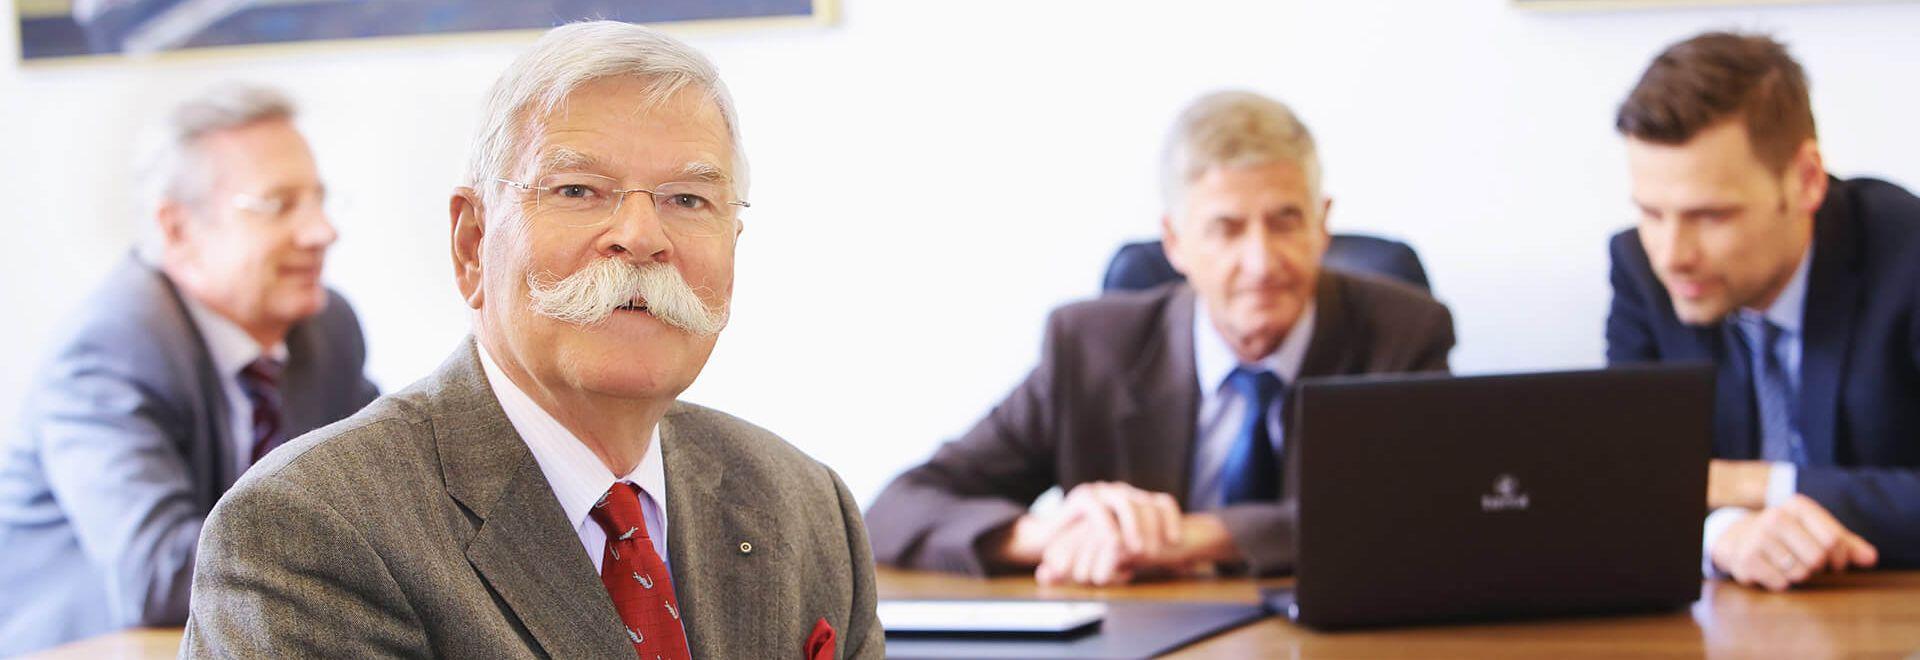 Rechtsanwalt und Notar a.D. Rüdiger Dorn und Kollegen